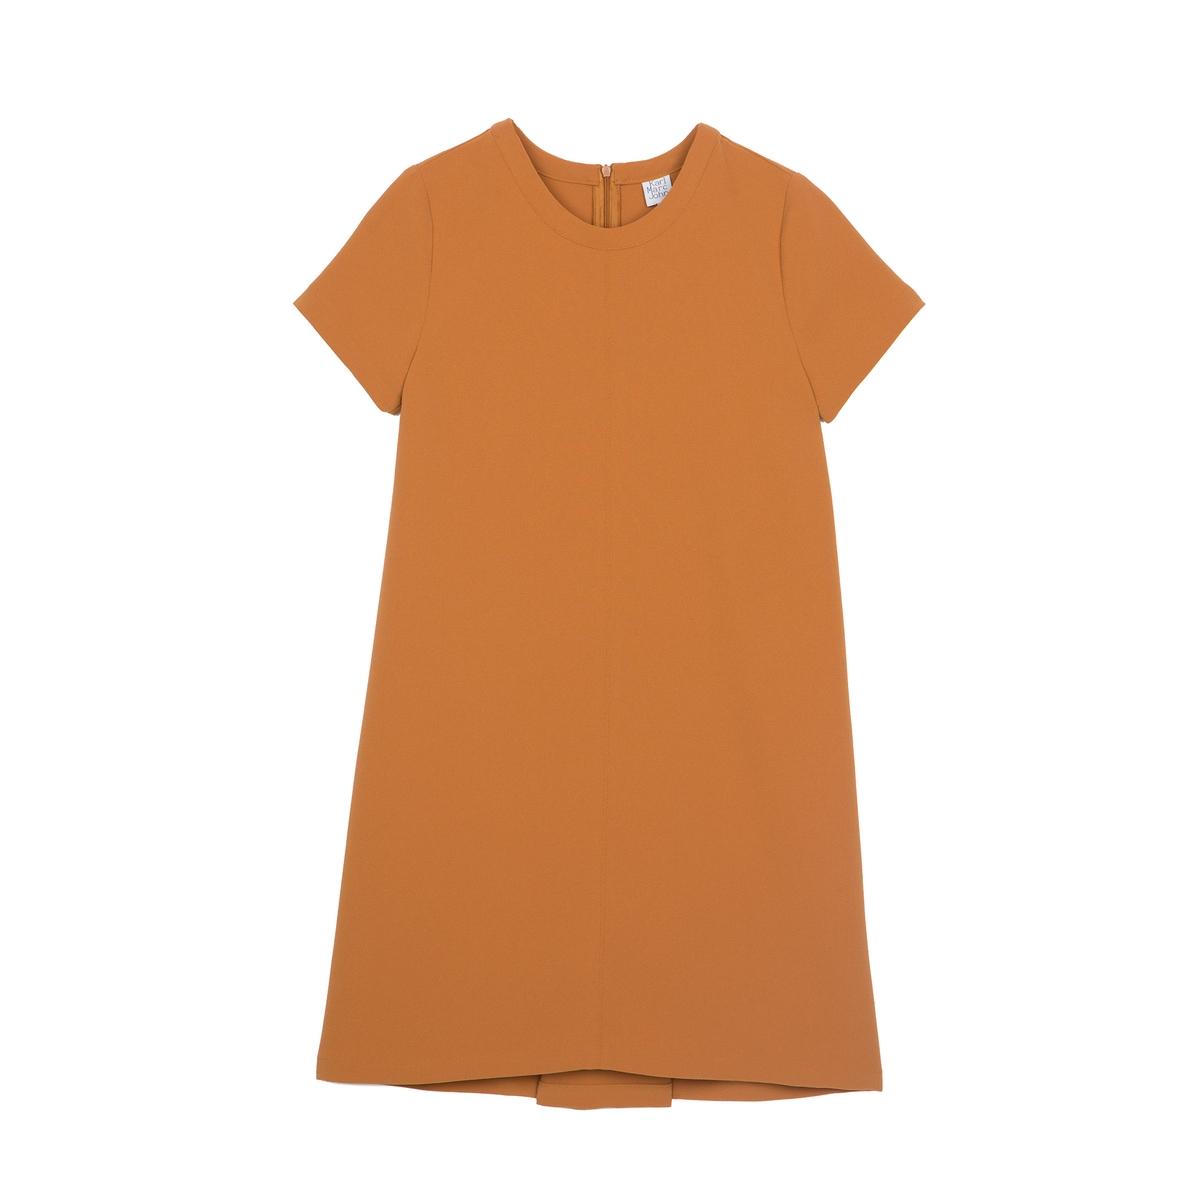 Платье с короткими рукавами RAMBO RAMBOСостав и описаниеМарка : KARL MARC JOHNМатериал :  100% полиэстер<br><br>Цвет: темно-бежевый<br>Размер: S